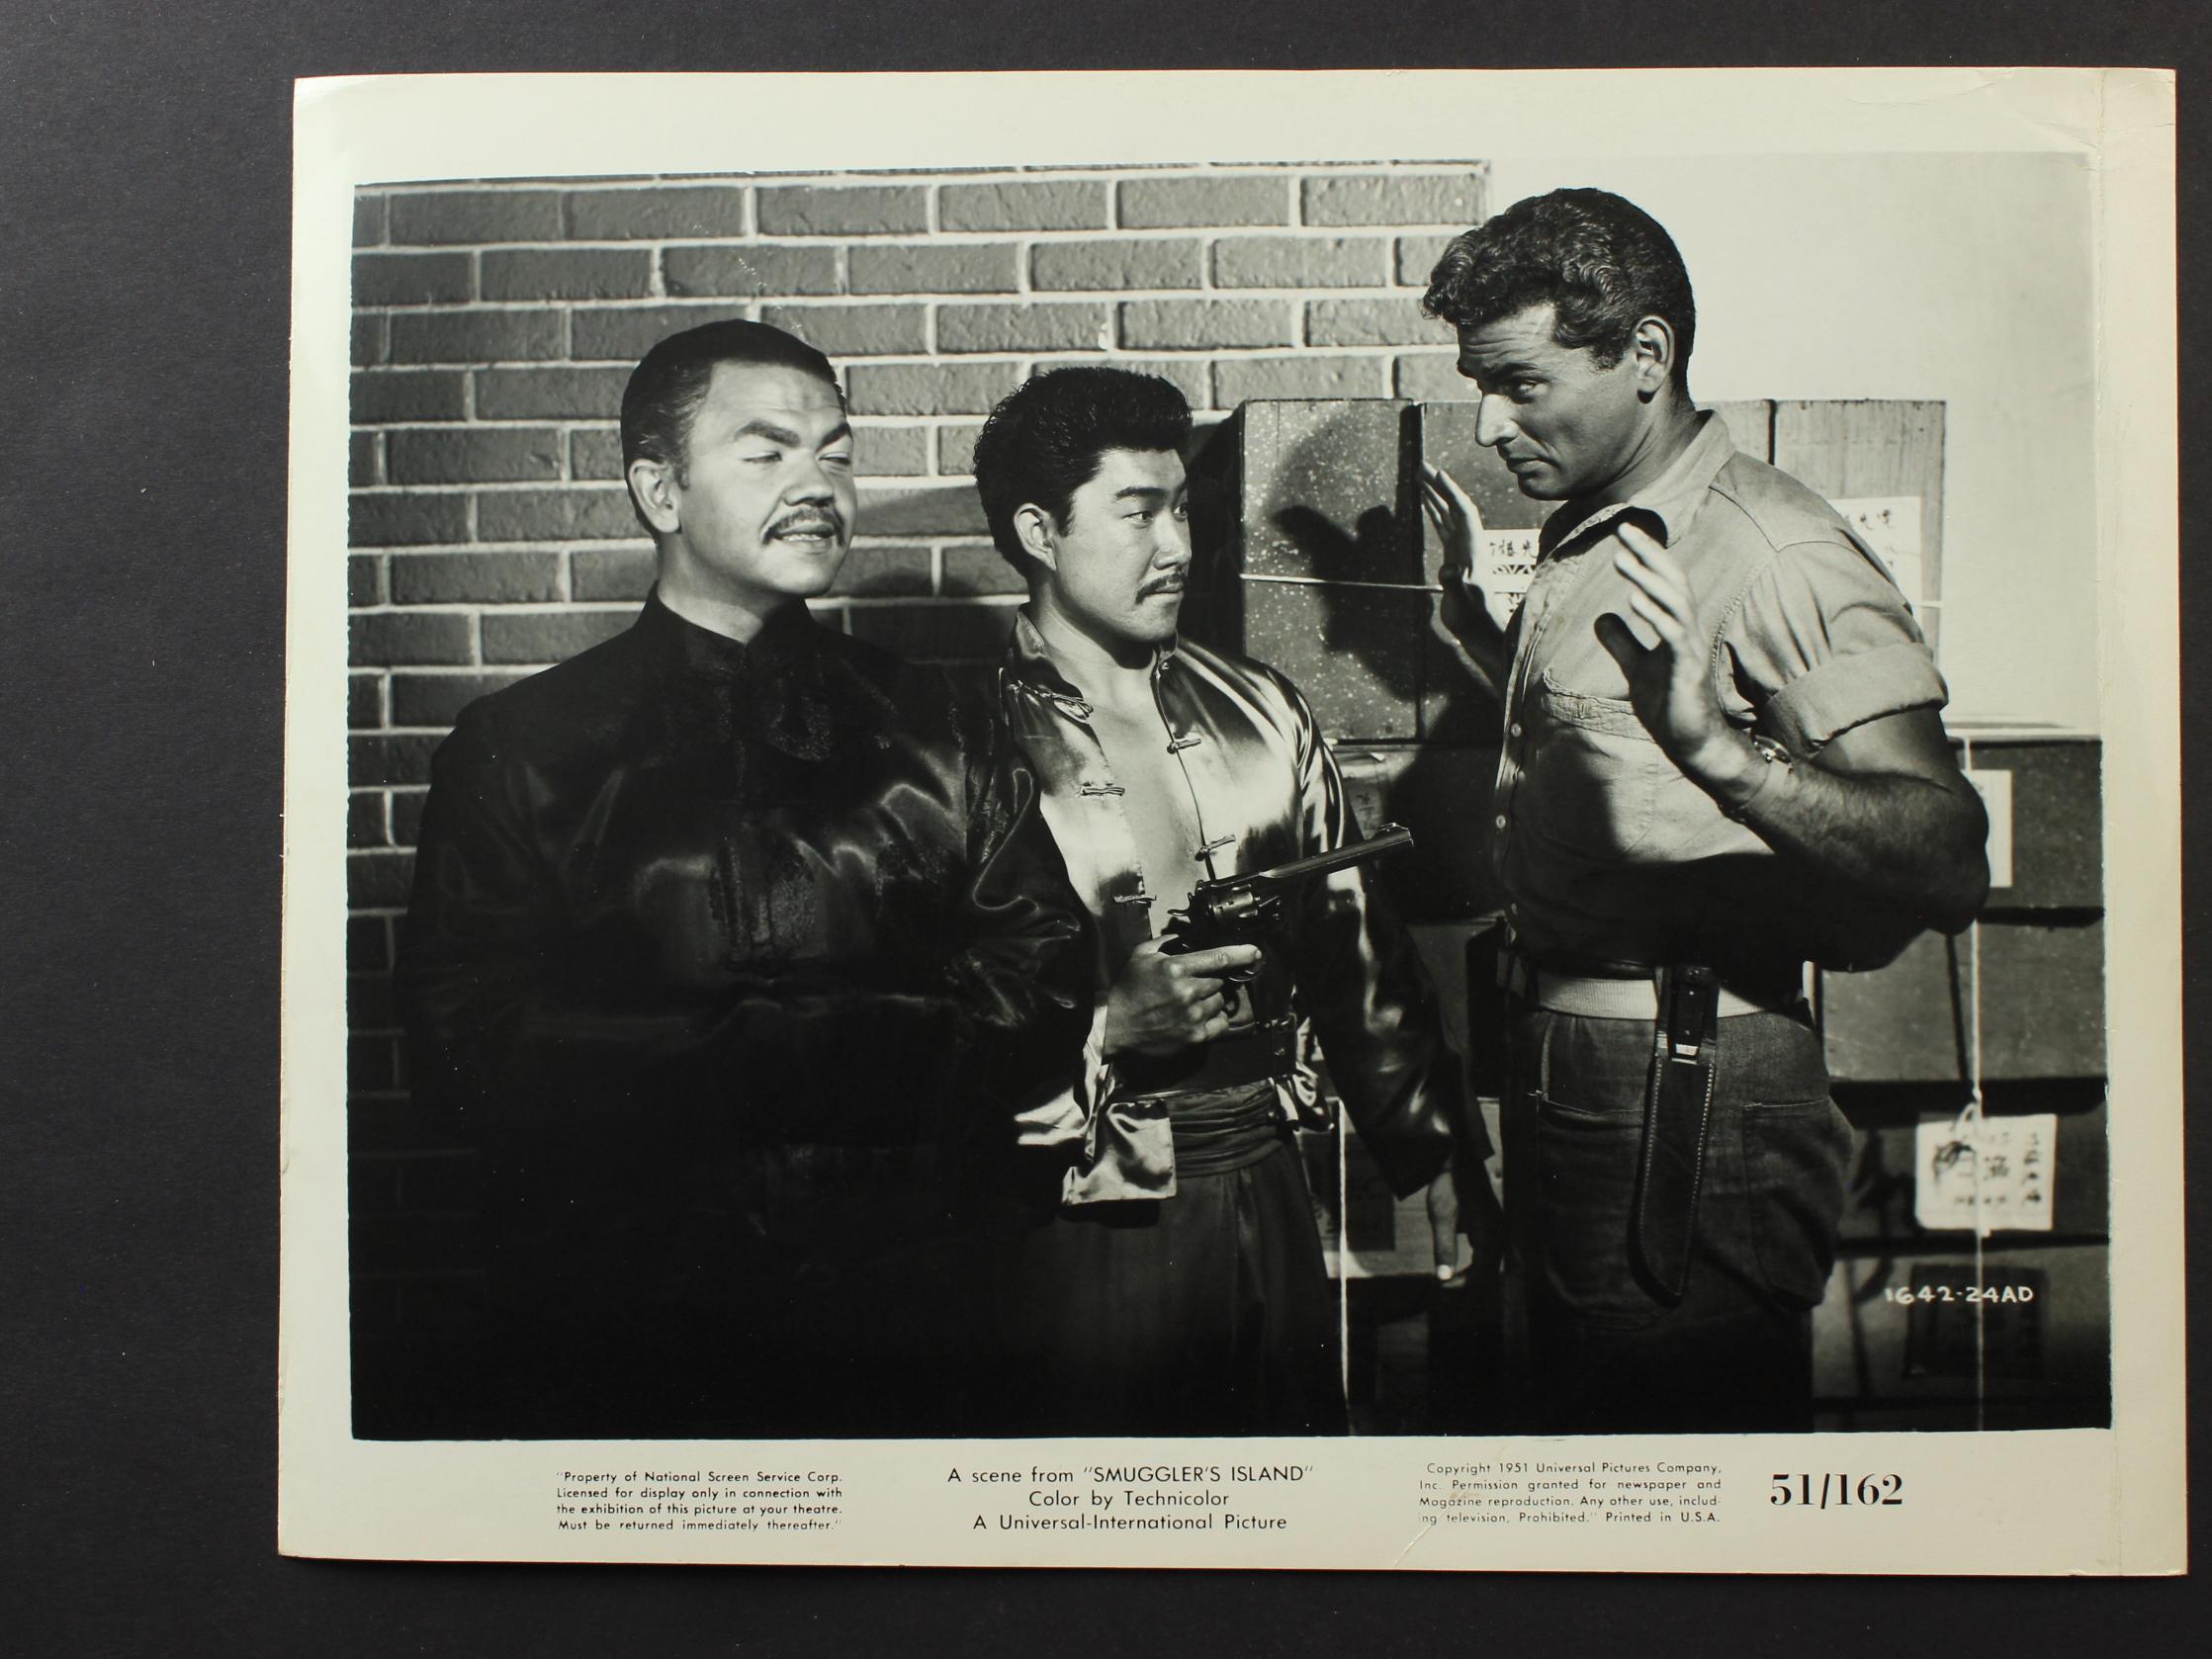 Smuggler's Island (1951)